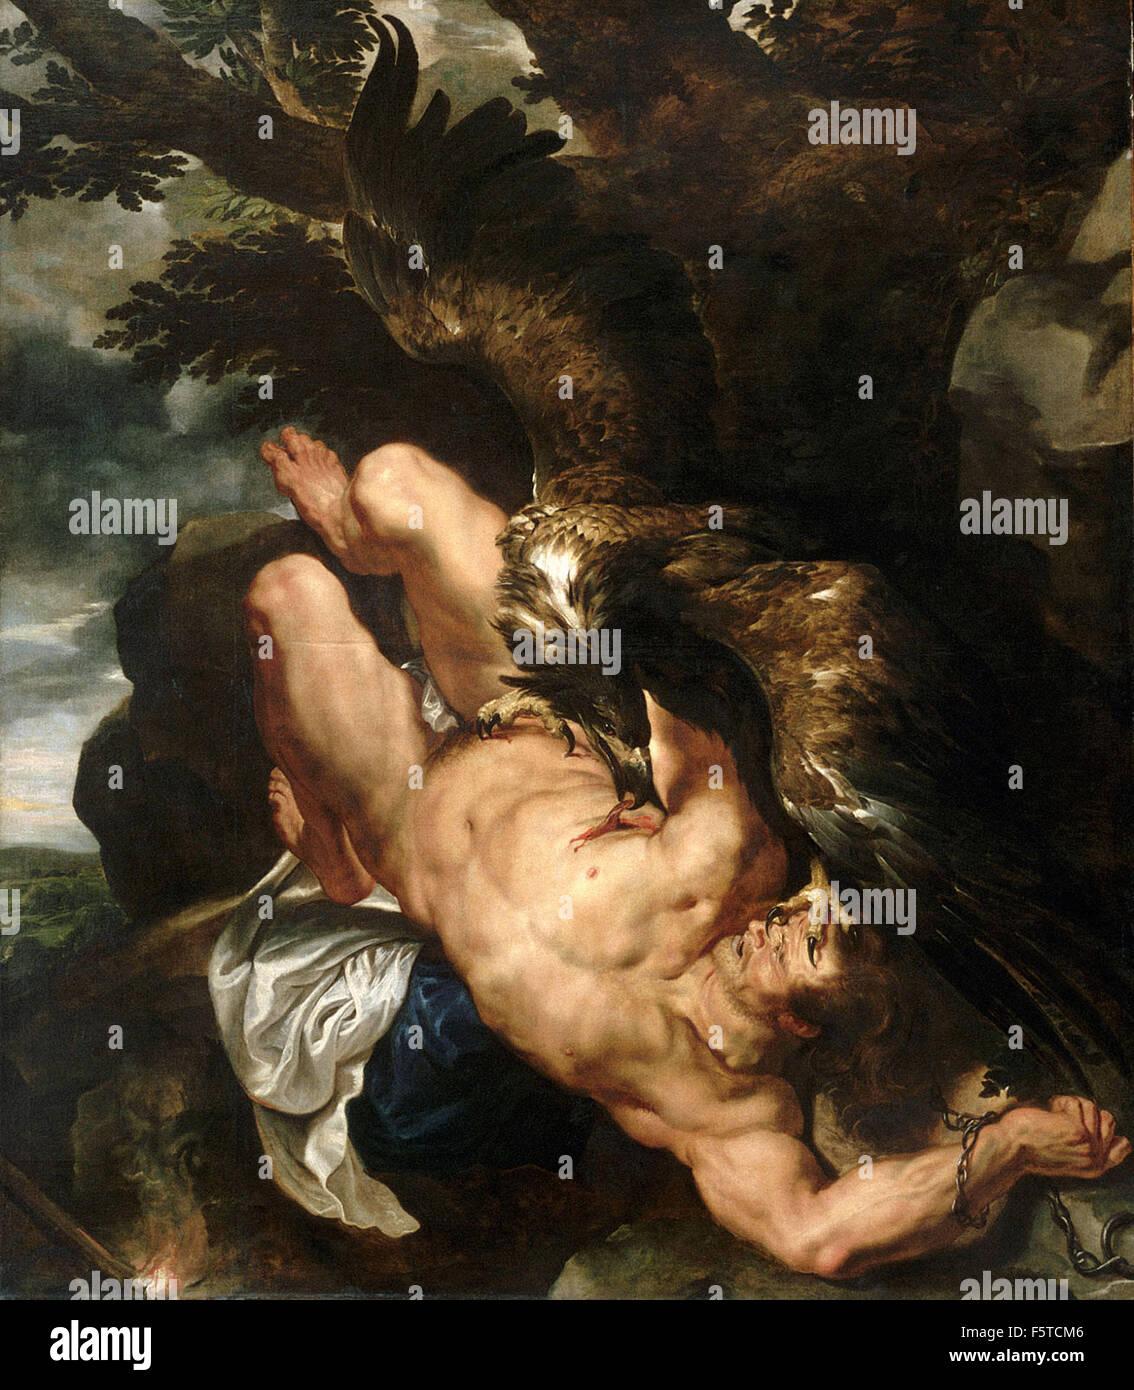 Peter Paul Rubens - Prometheus Bound - Stock Image